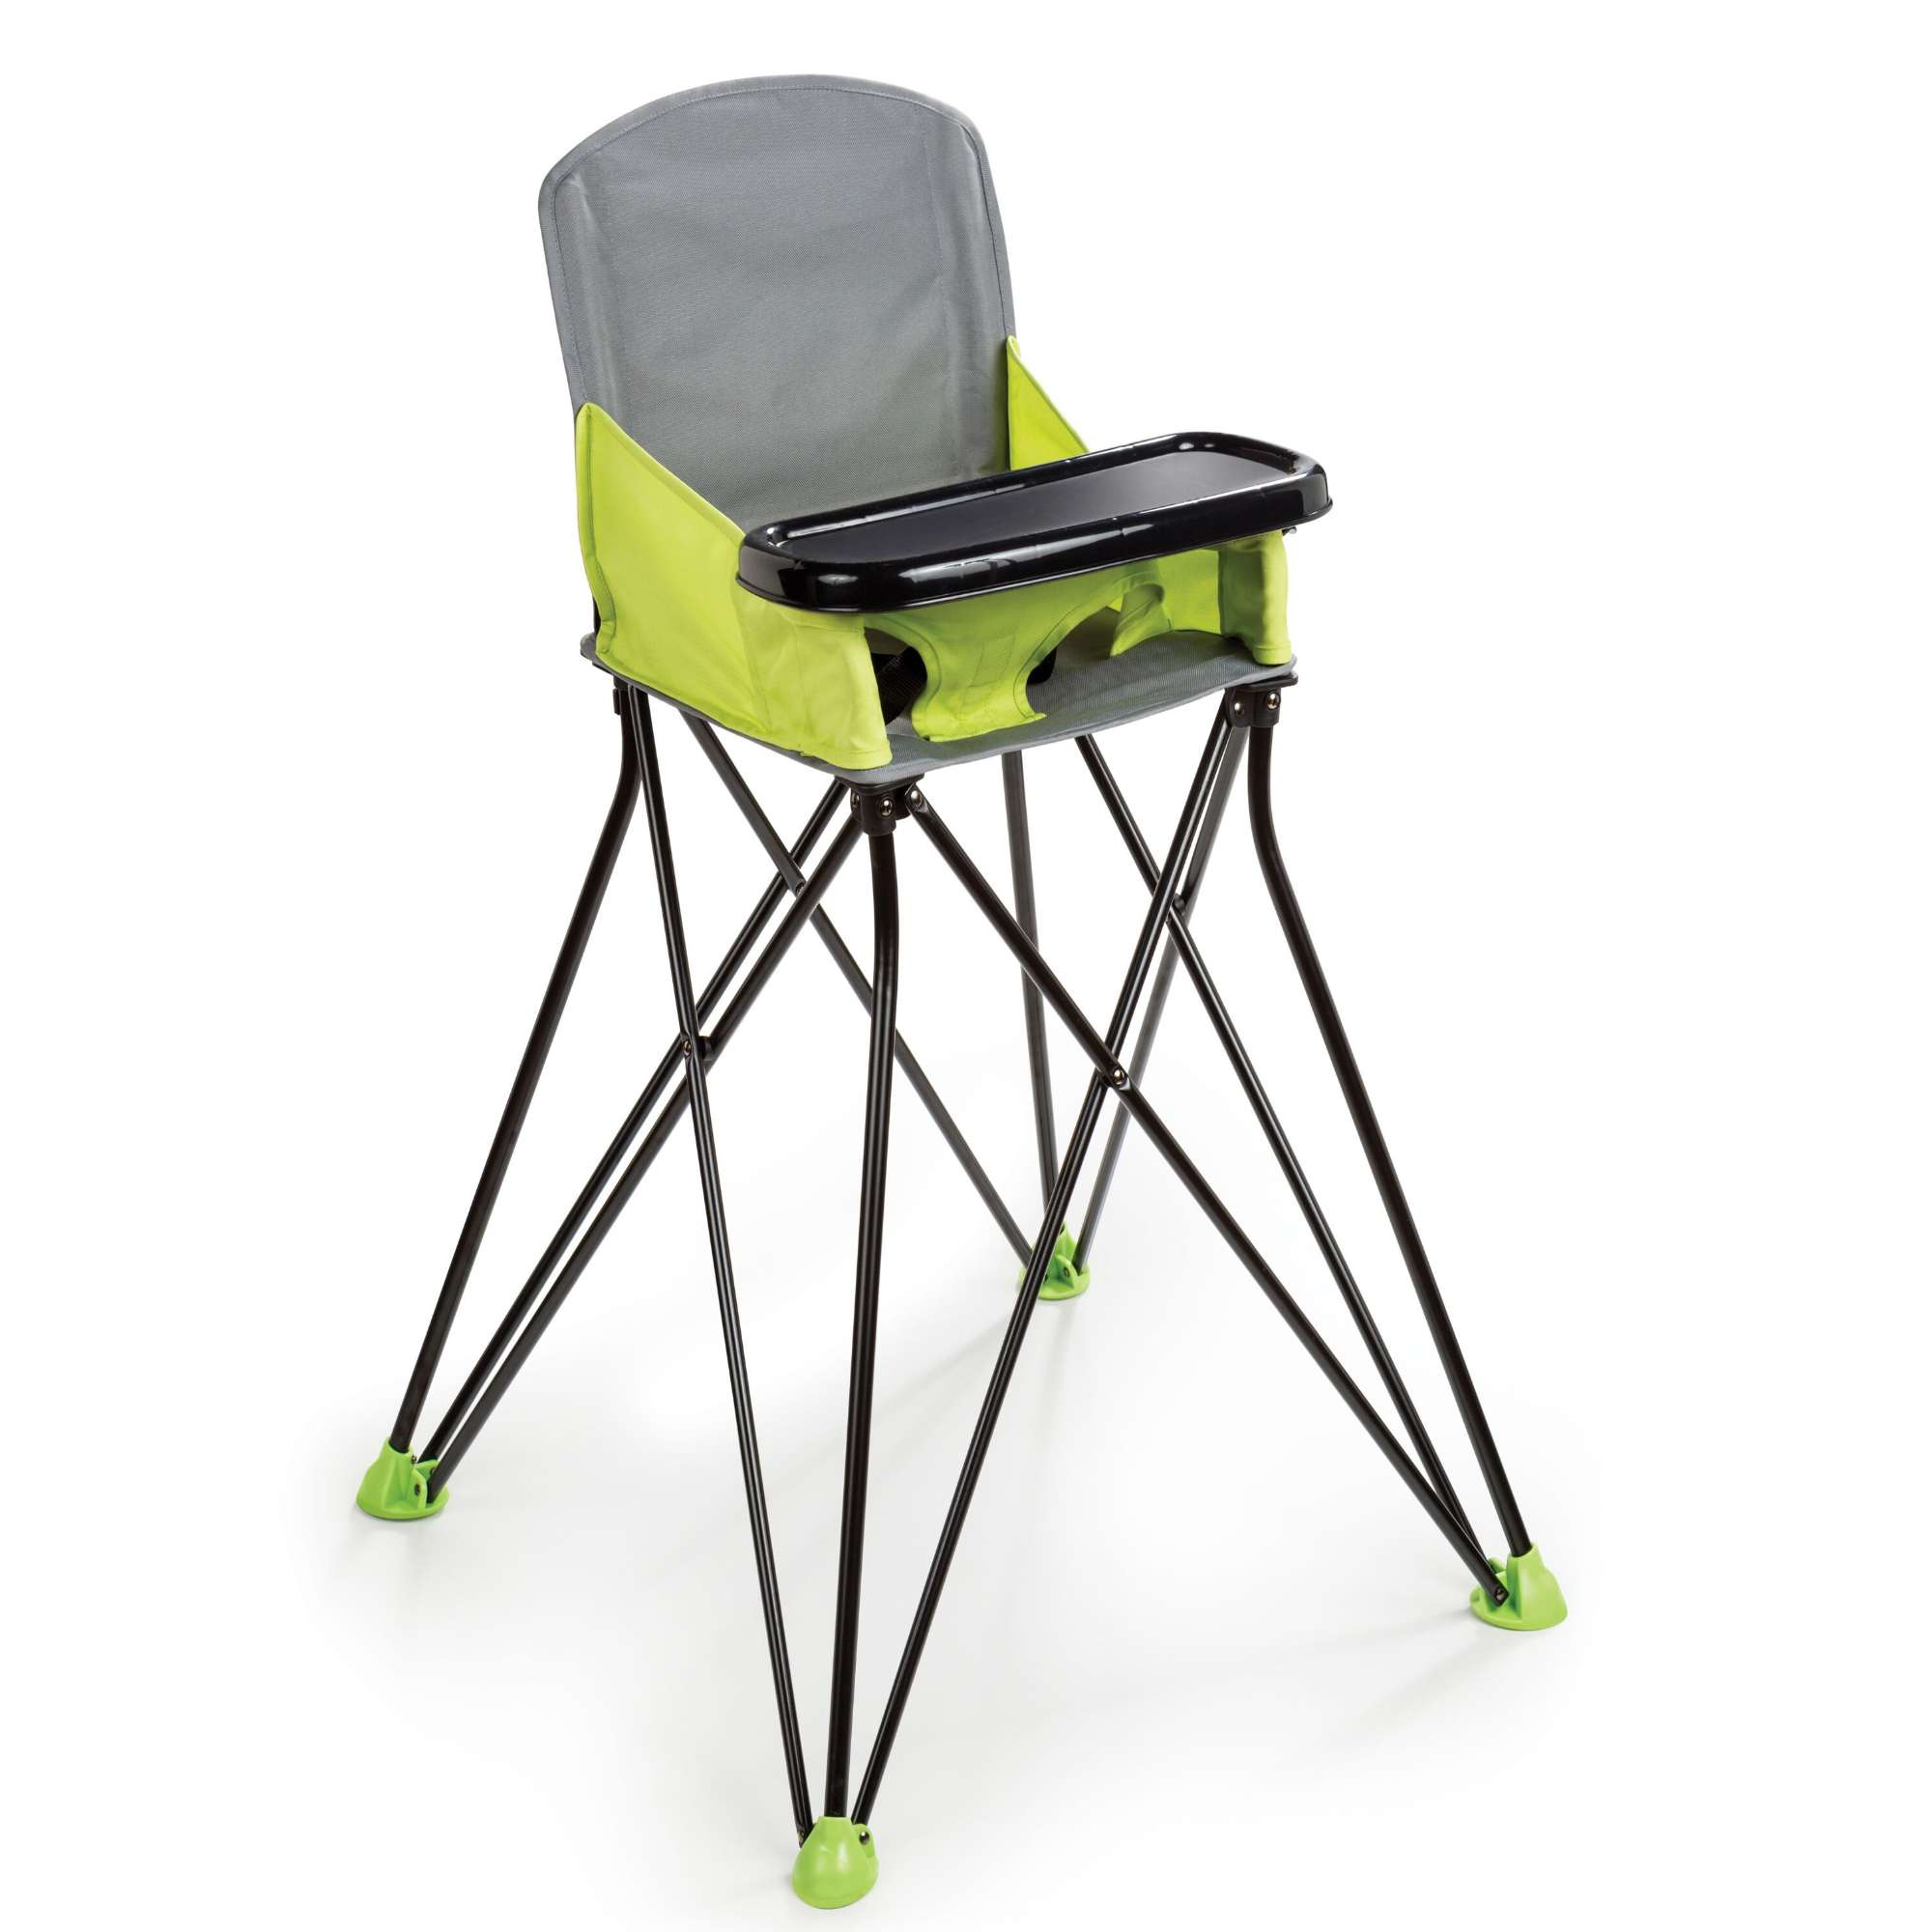 Summer-Infant-Pop-N-Sit-Portable-Highchair